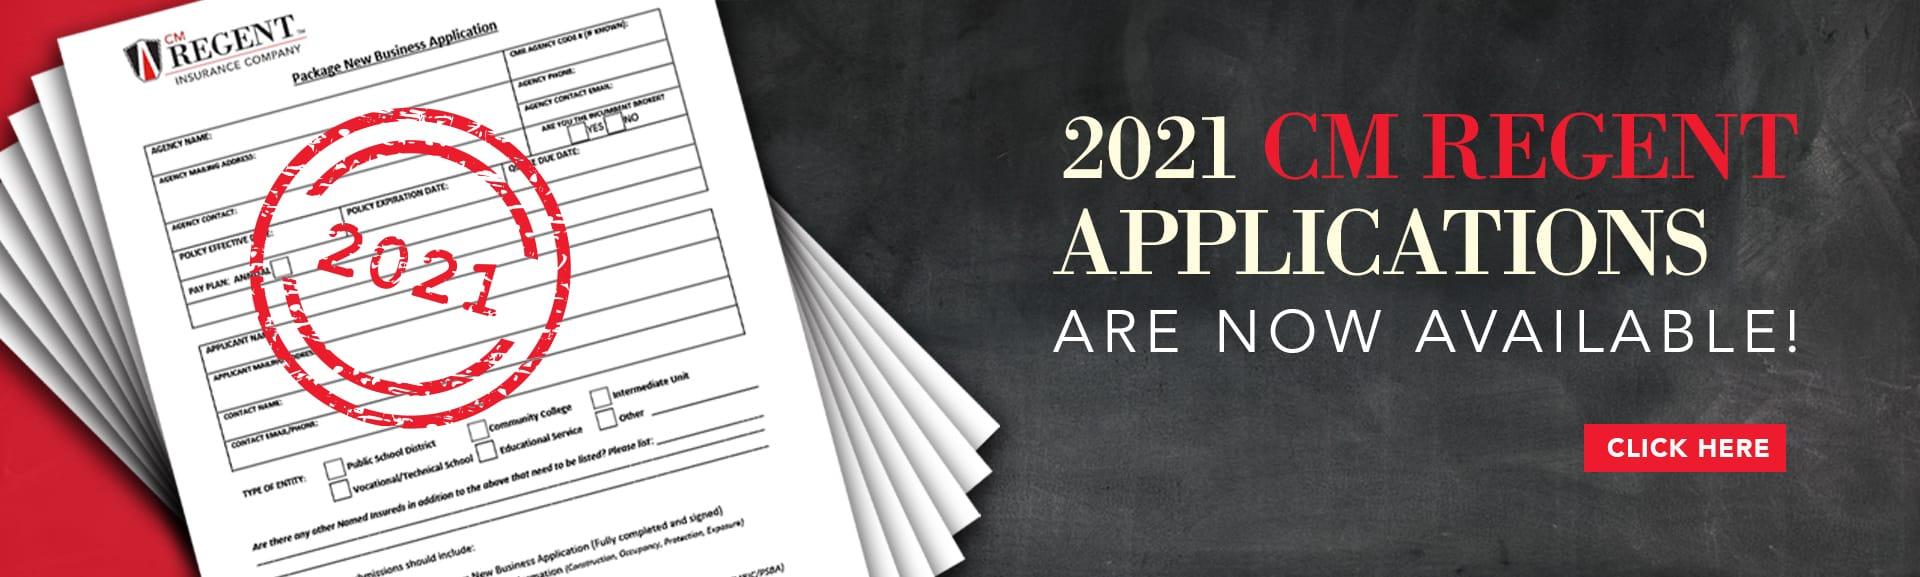 CM Regent 2021 Applications